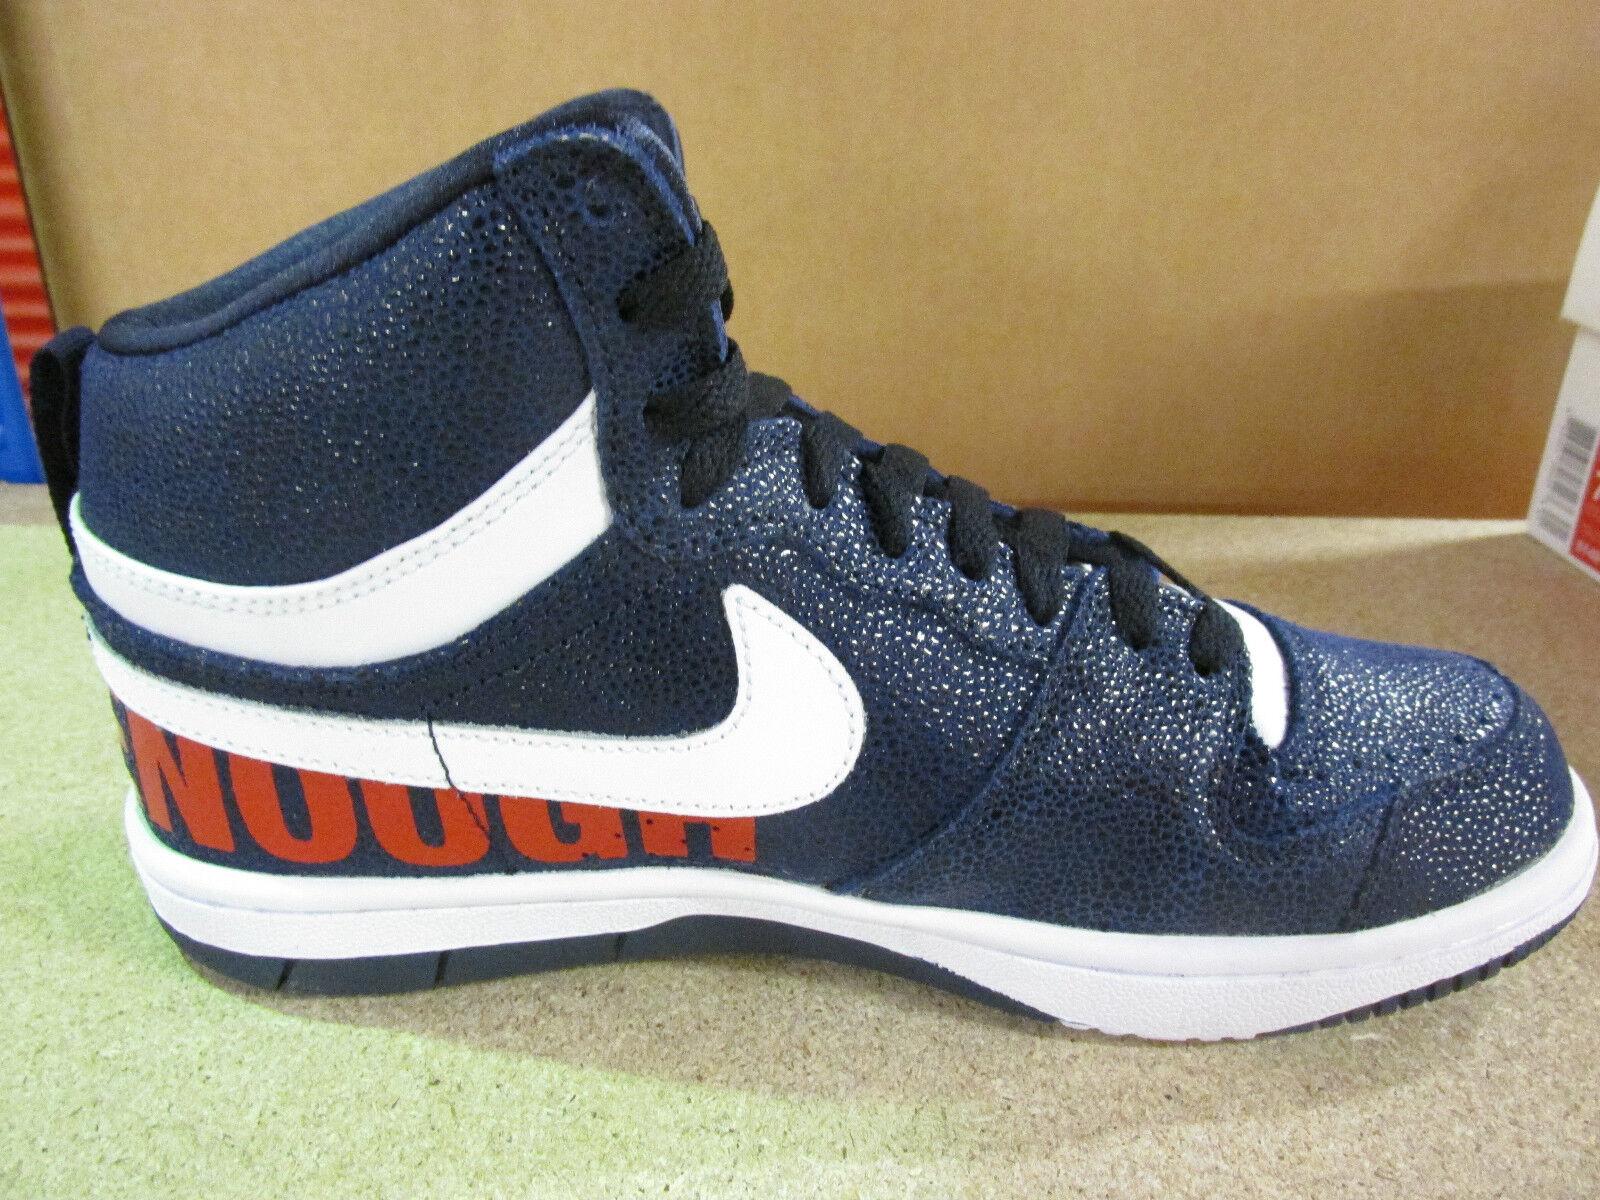 Nike Court Force SP Fragment scarpe scarpe scarpe da ginnastica Uomo Scarpe Scarpe da ginnastica 814913 414 8ac9bd